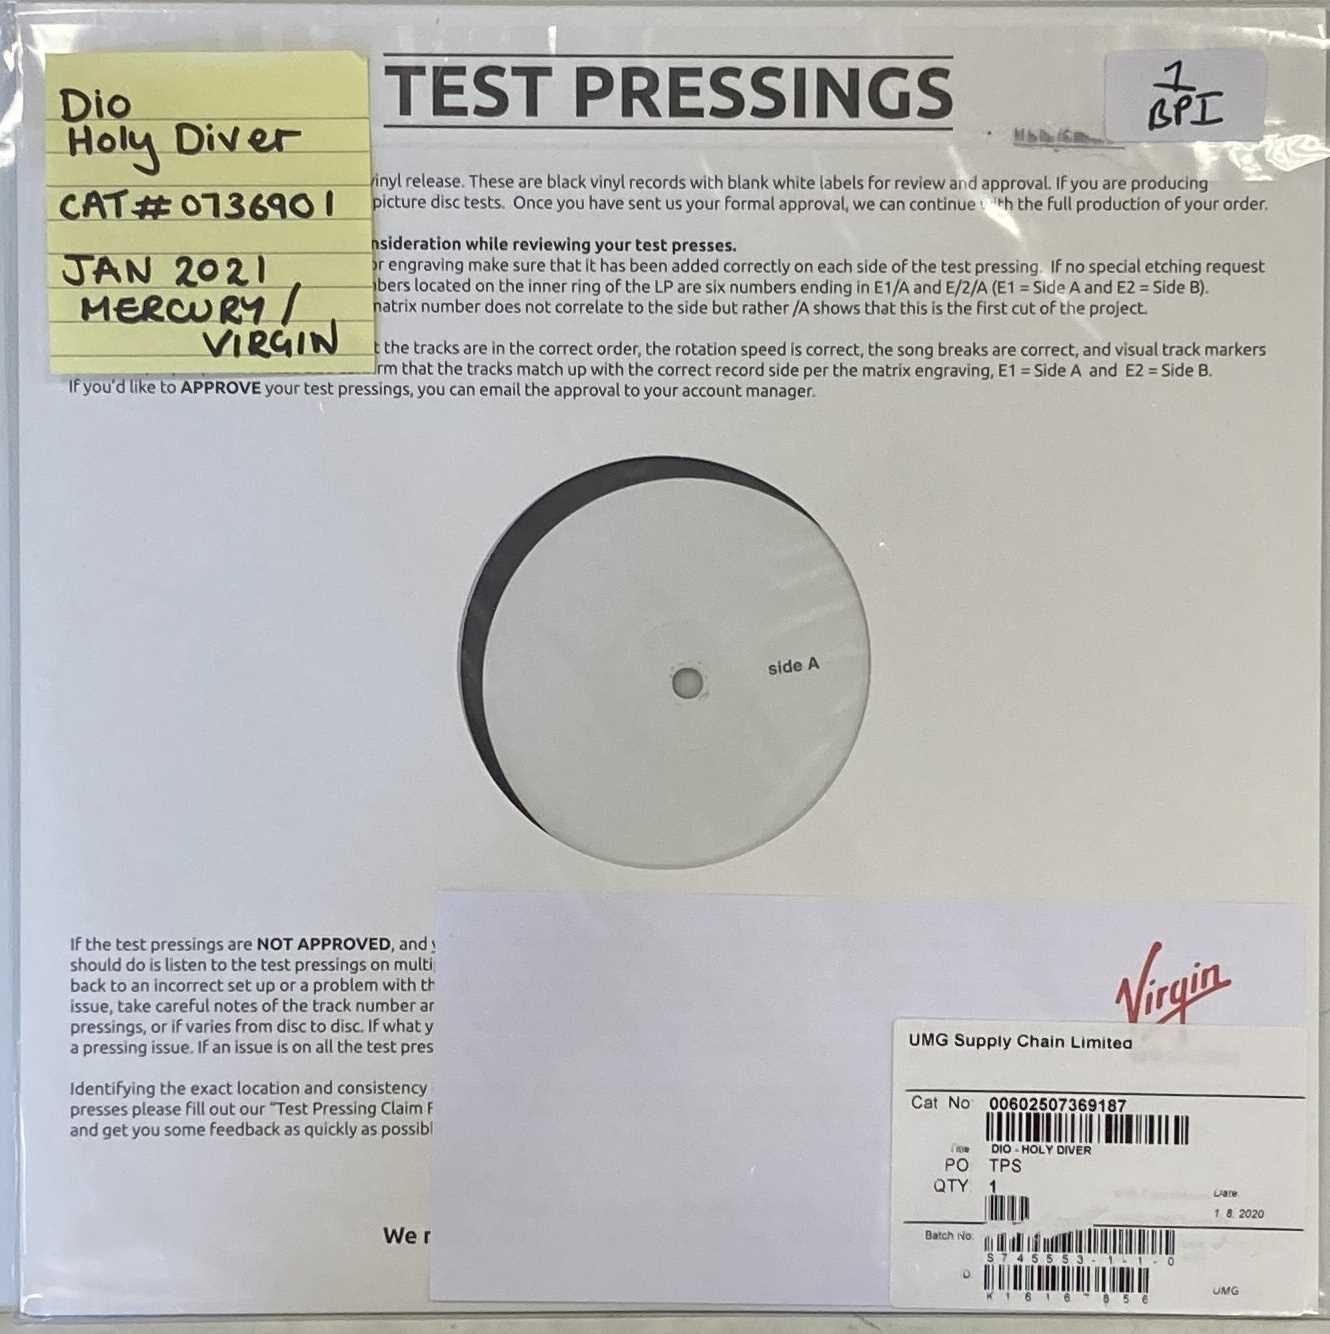 Lot 1 - DIO - HOLY DIVER LP (MERCURY/VIRGIN 2021 TEST PRESSING - 0736901)